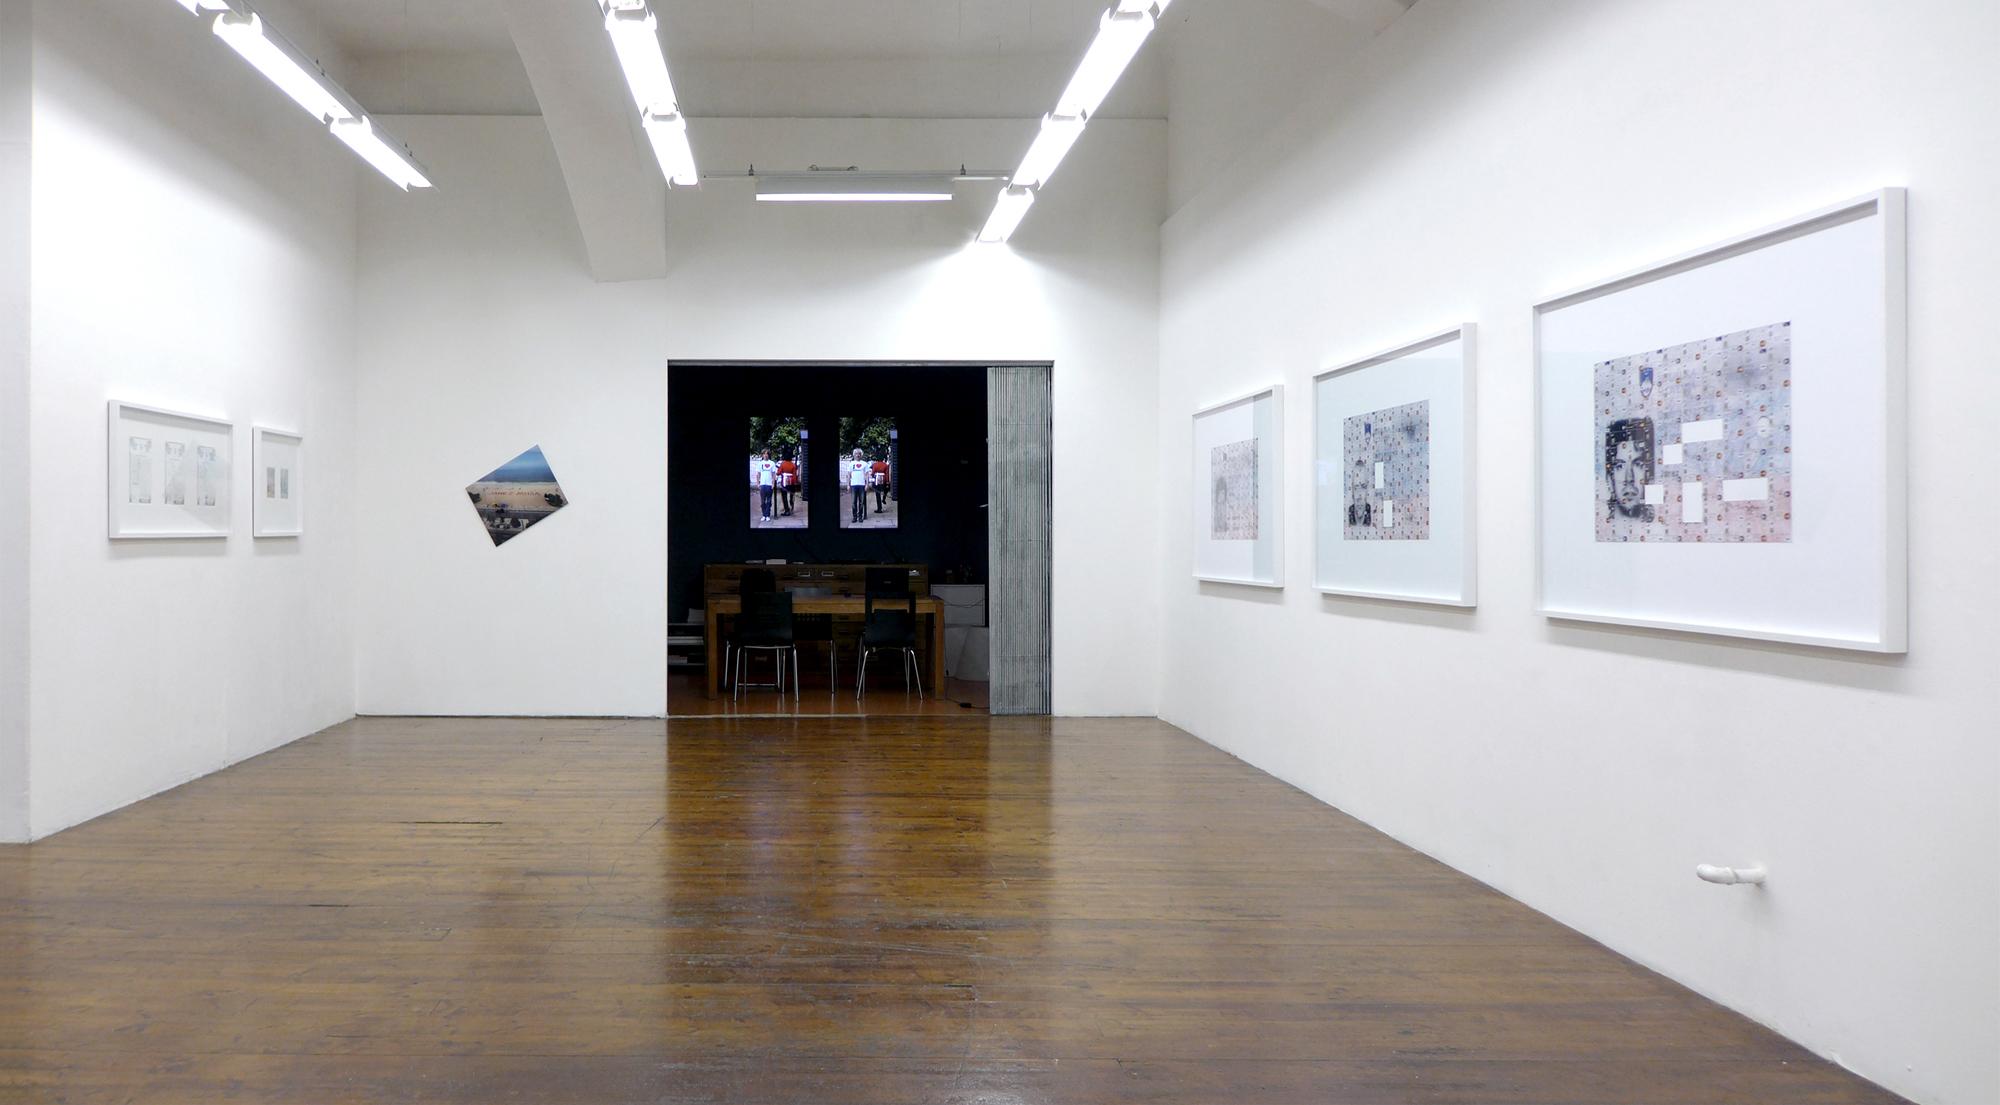 Janez Janša,Janez Janša,Janez Janša exhibition MLZ Art Dep, 2018